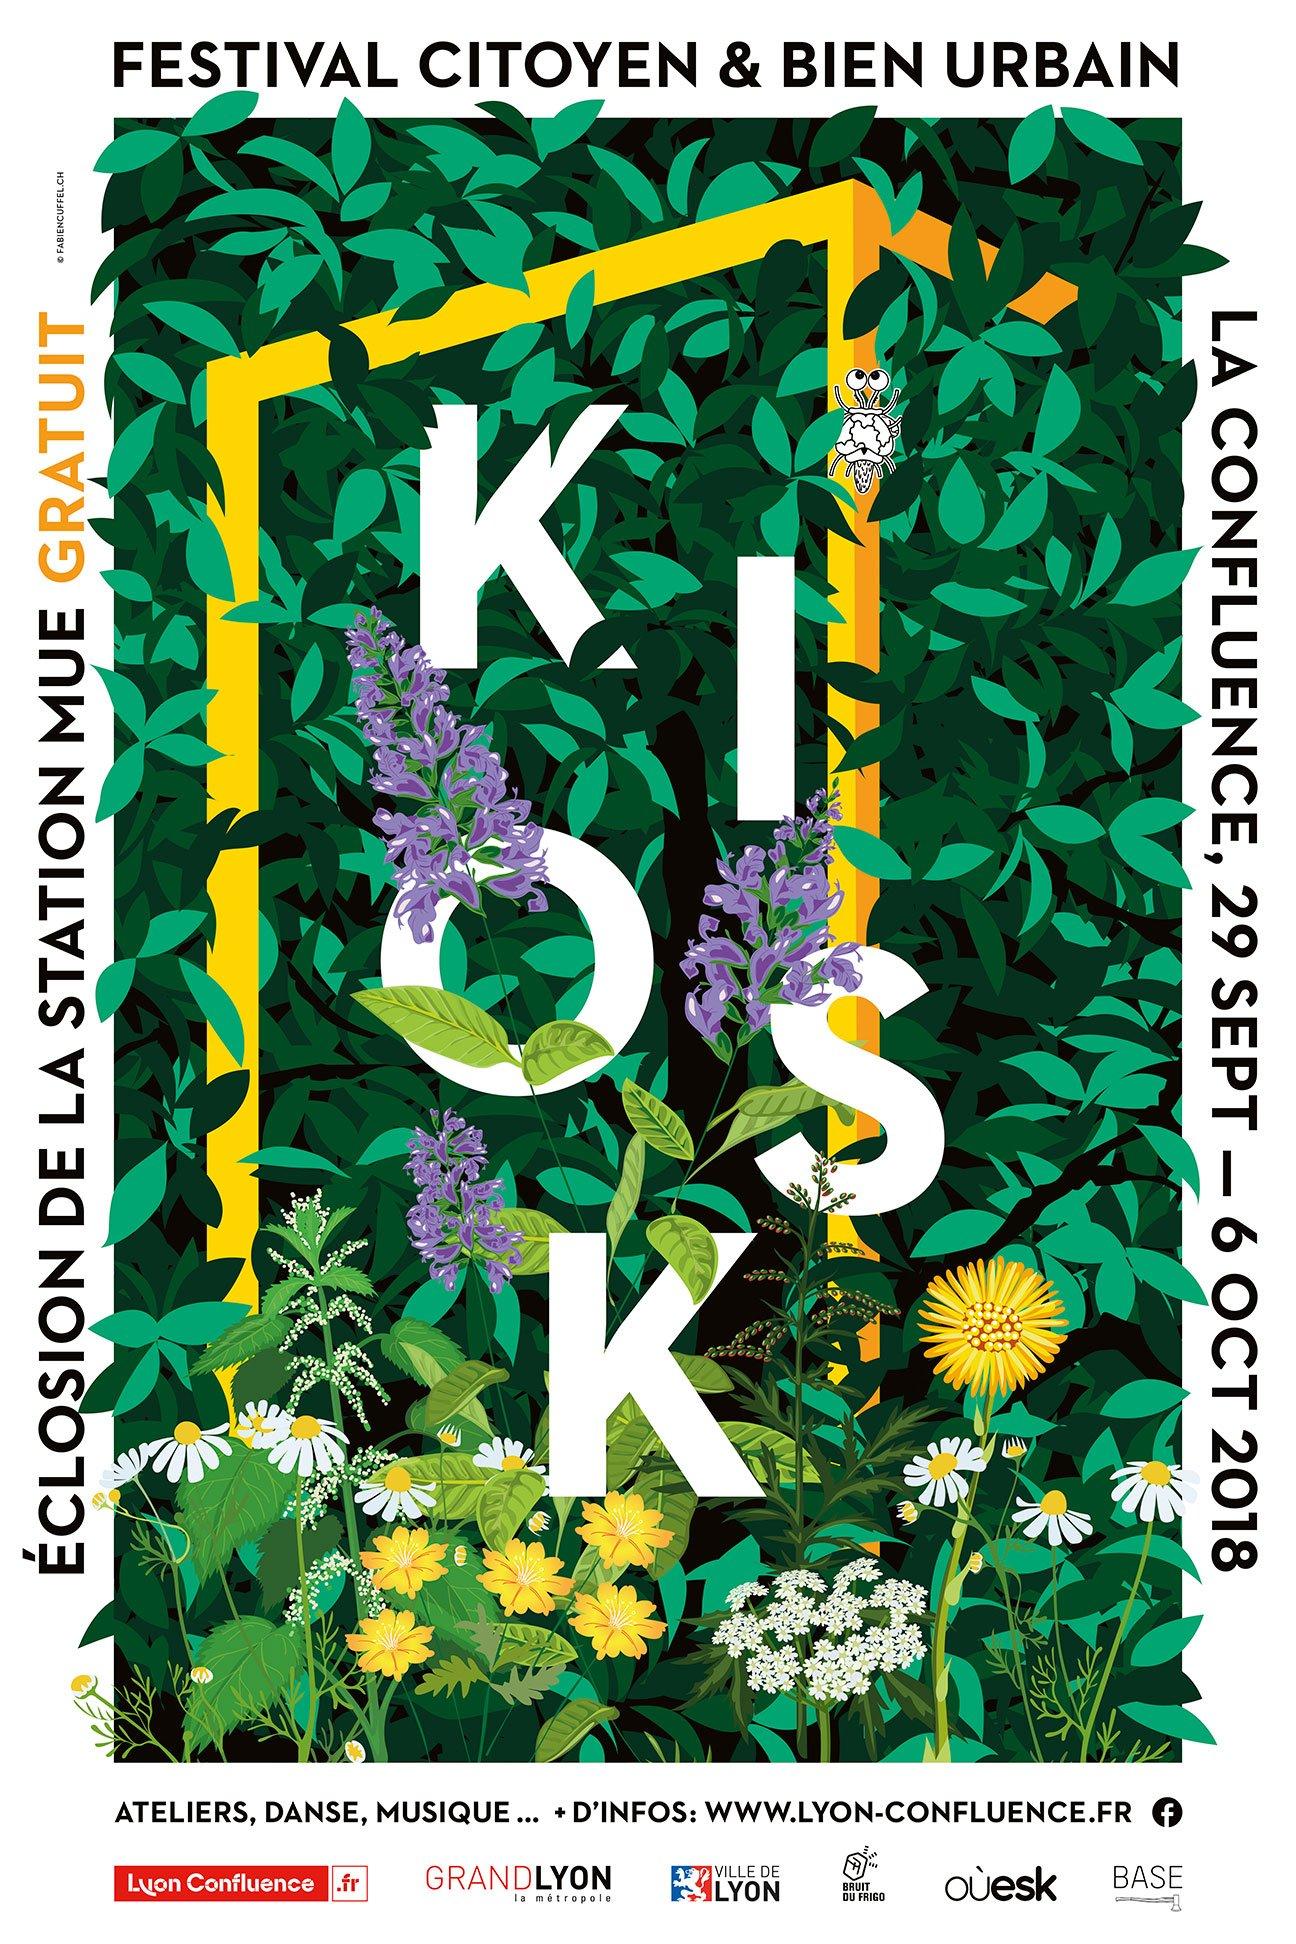 Fabien_cuffel_affiche_festival_Kiosk_lyon_confluence_2018